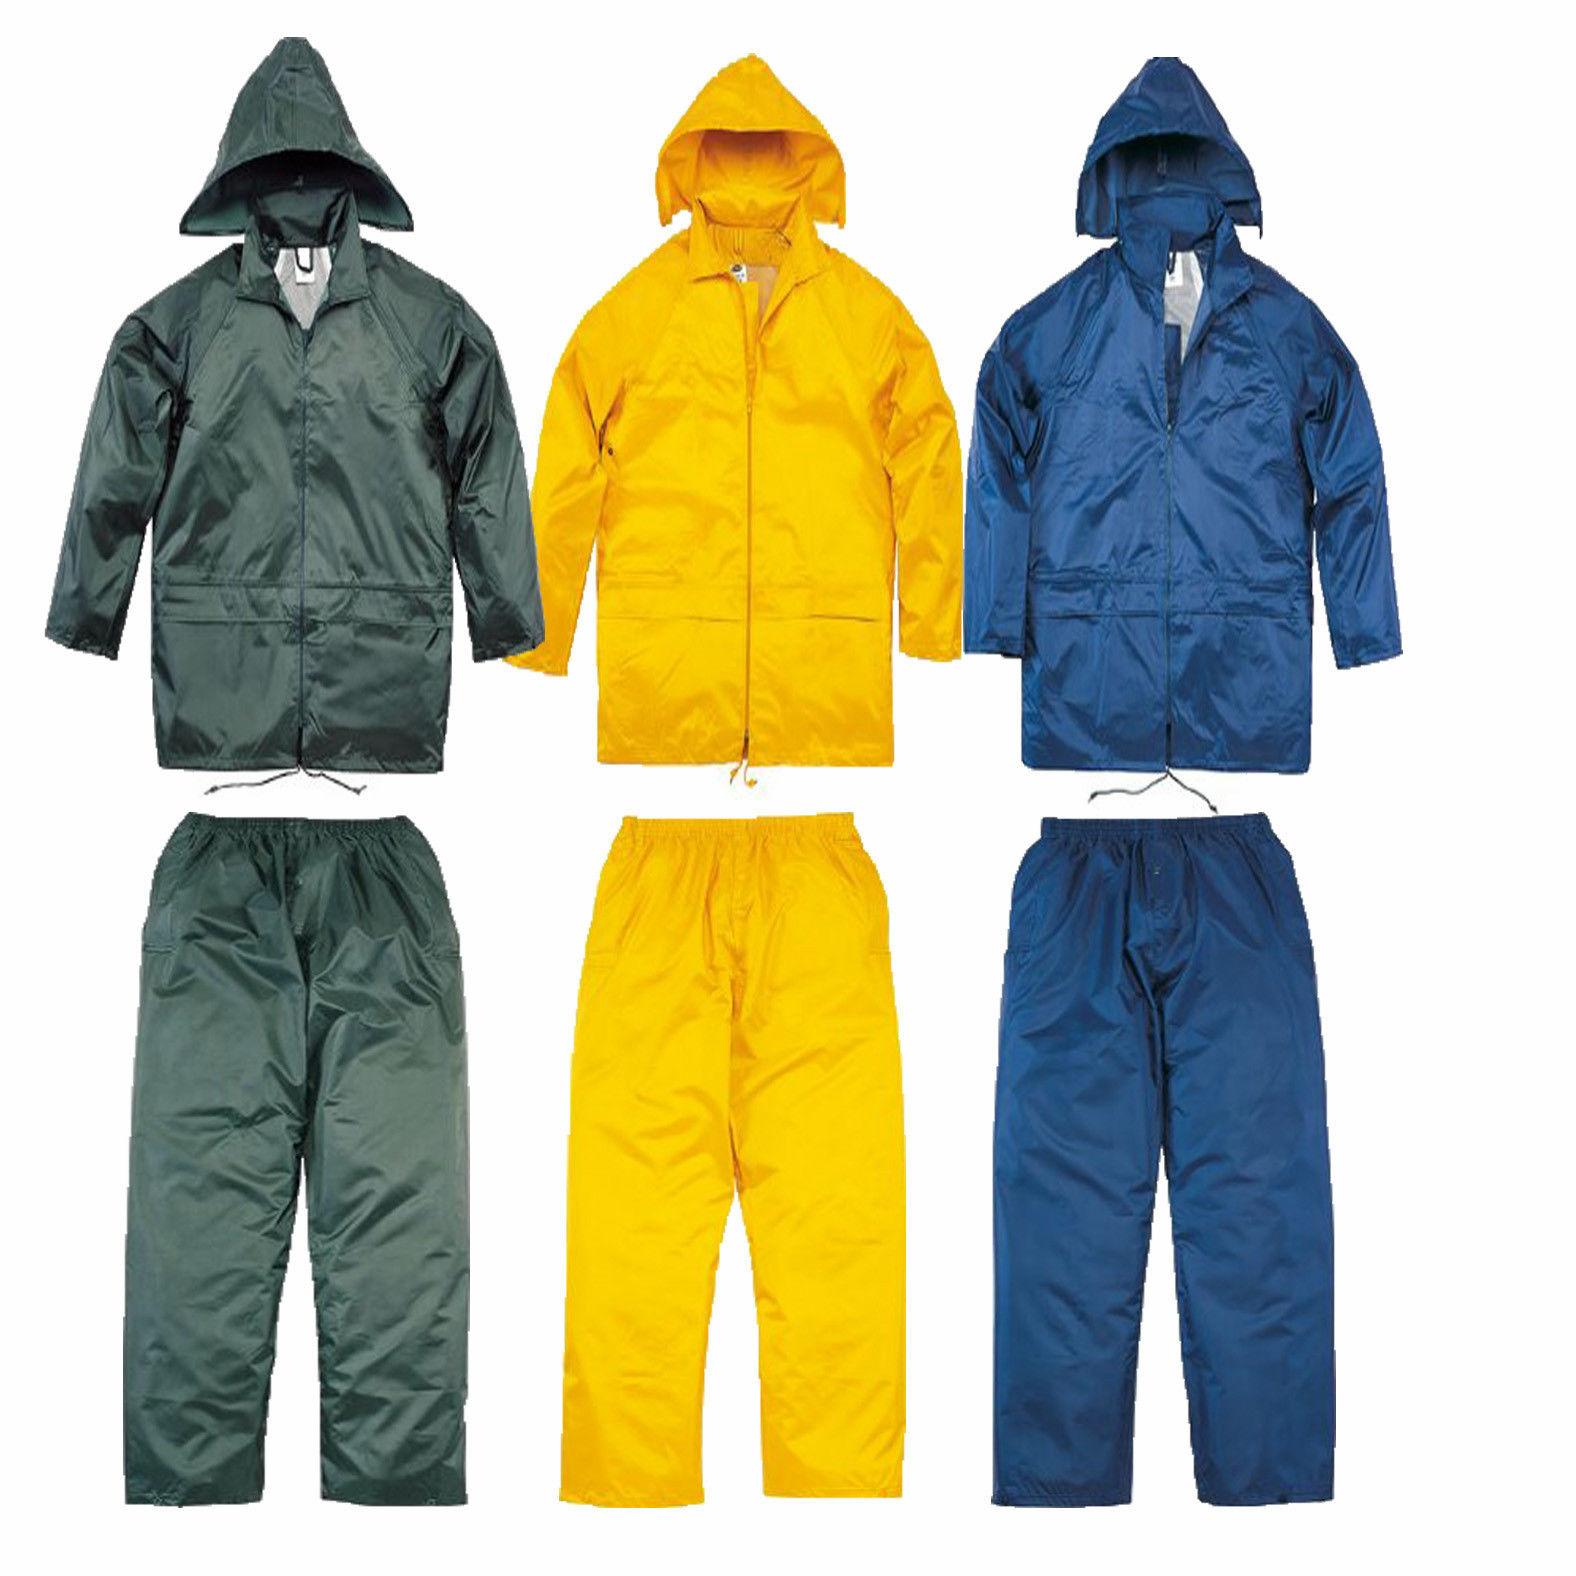 Delta Plus PVC Waterproof Rain Suit Trouser / Hooded ...